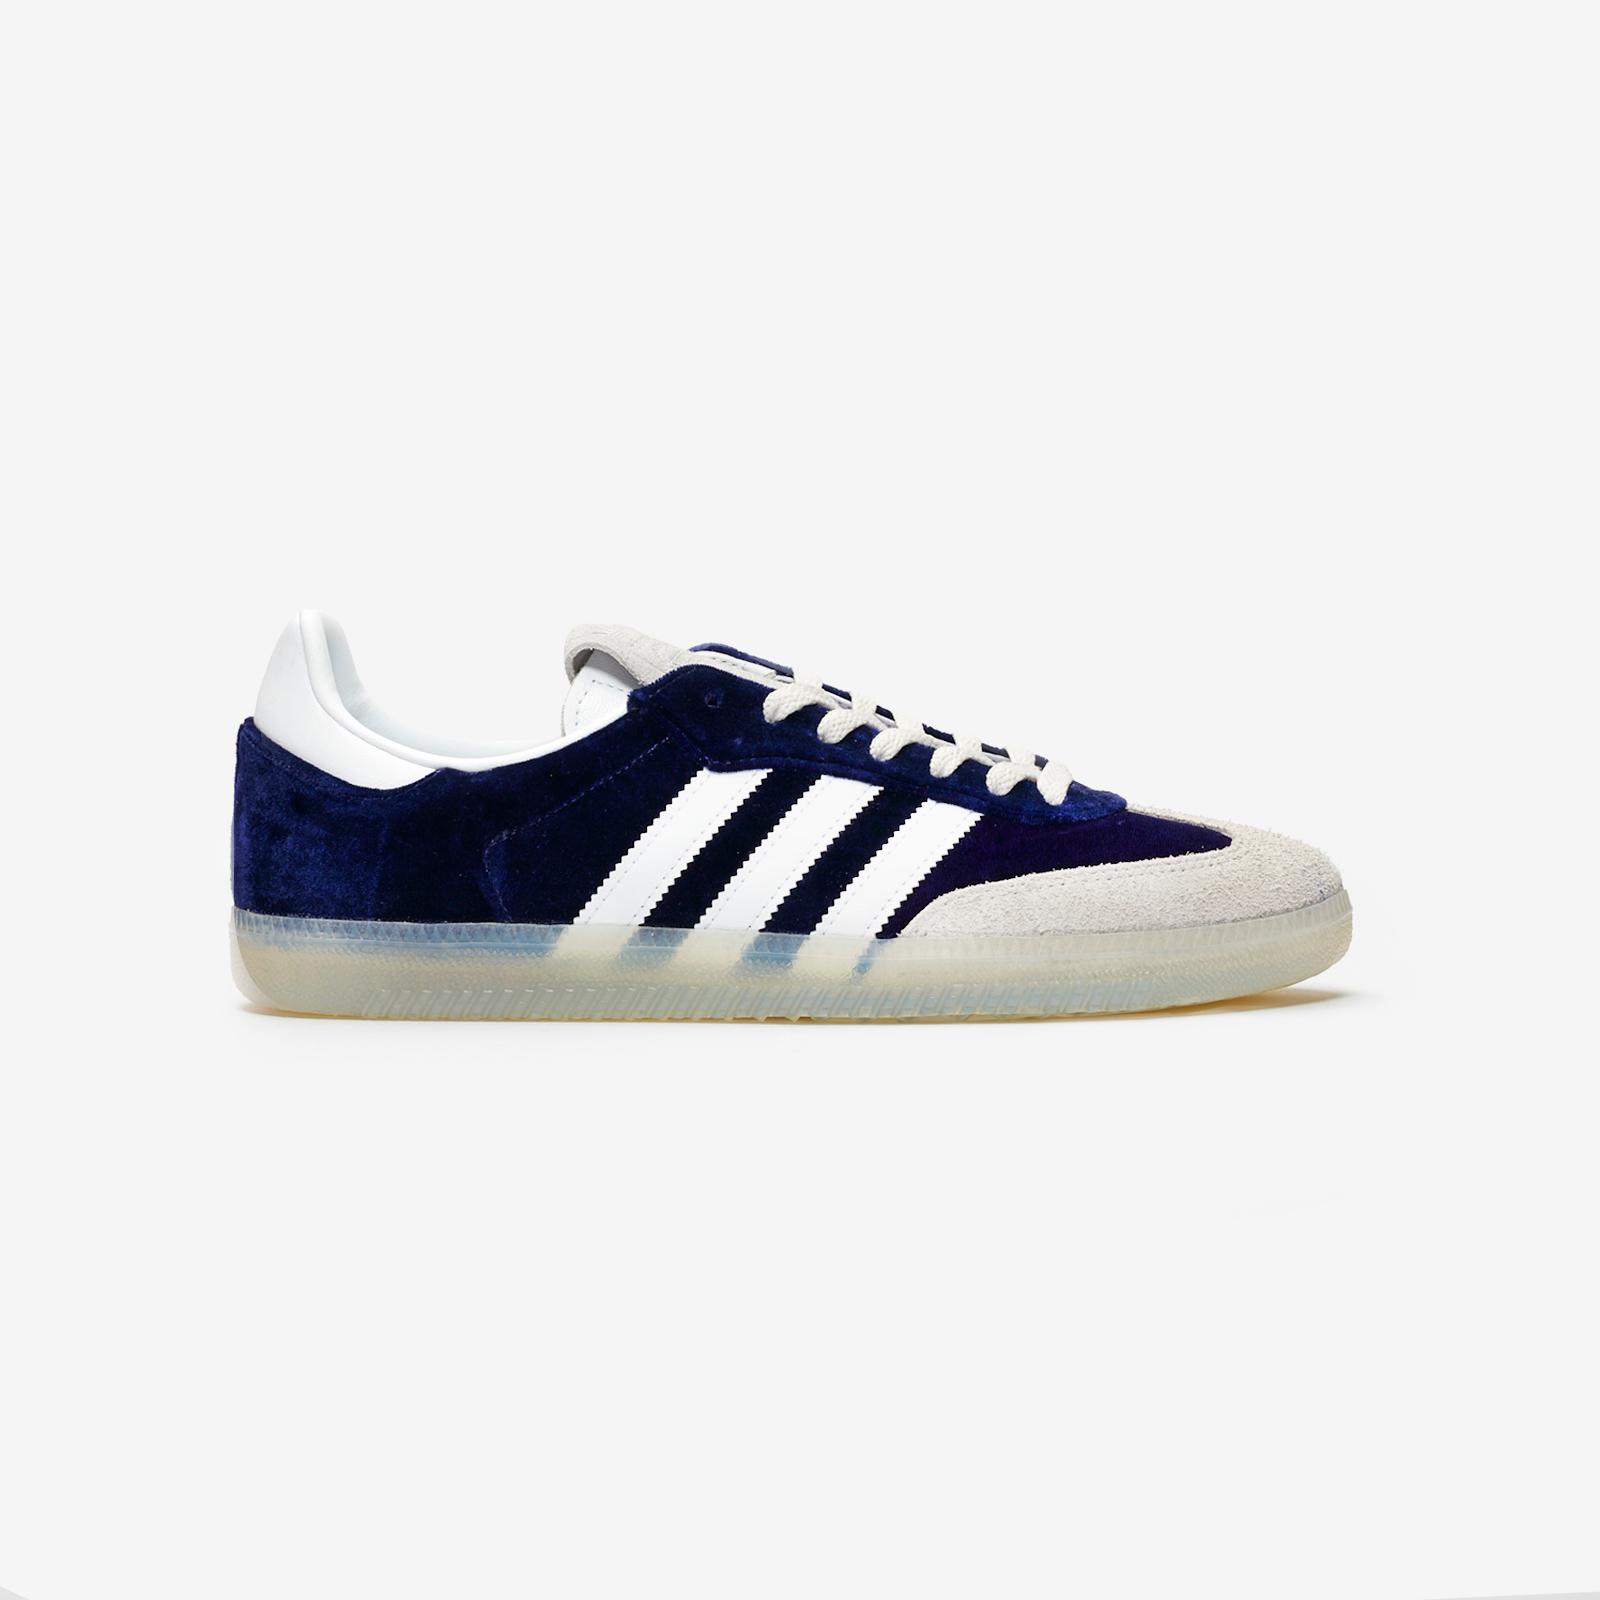 adidas Samba OG - Db3011 - Sneakersnstuff I Sneakers ...